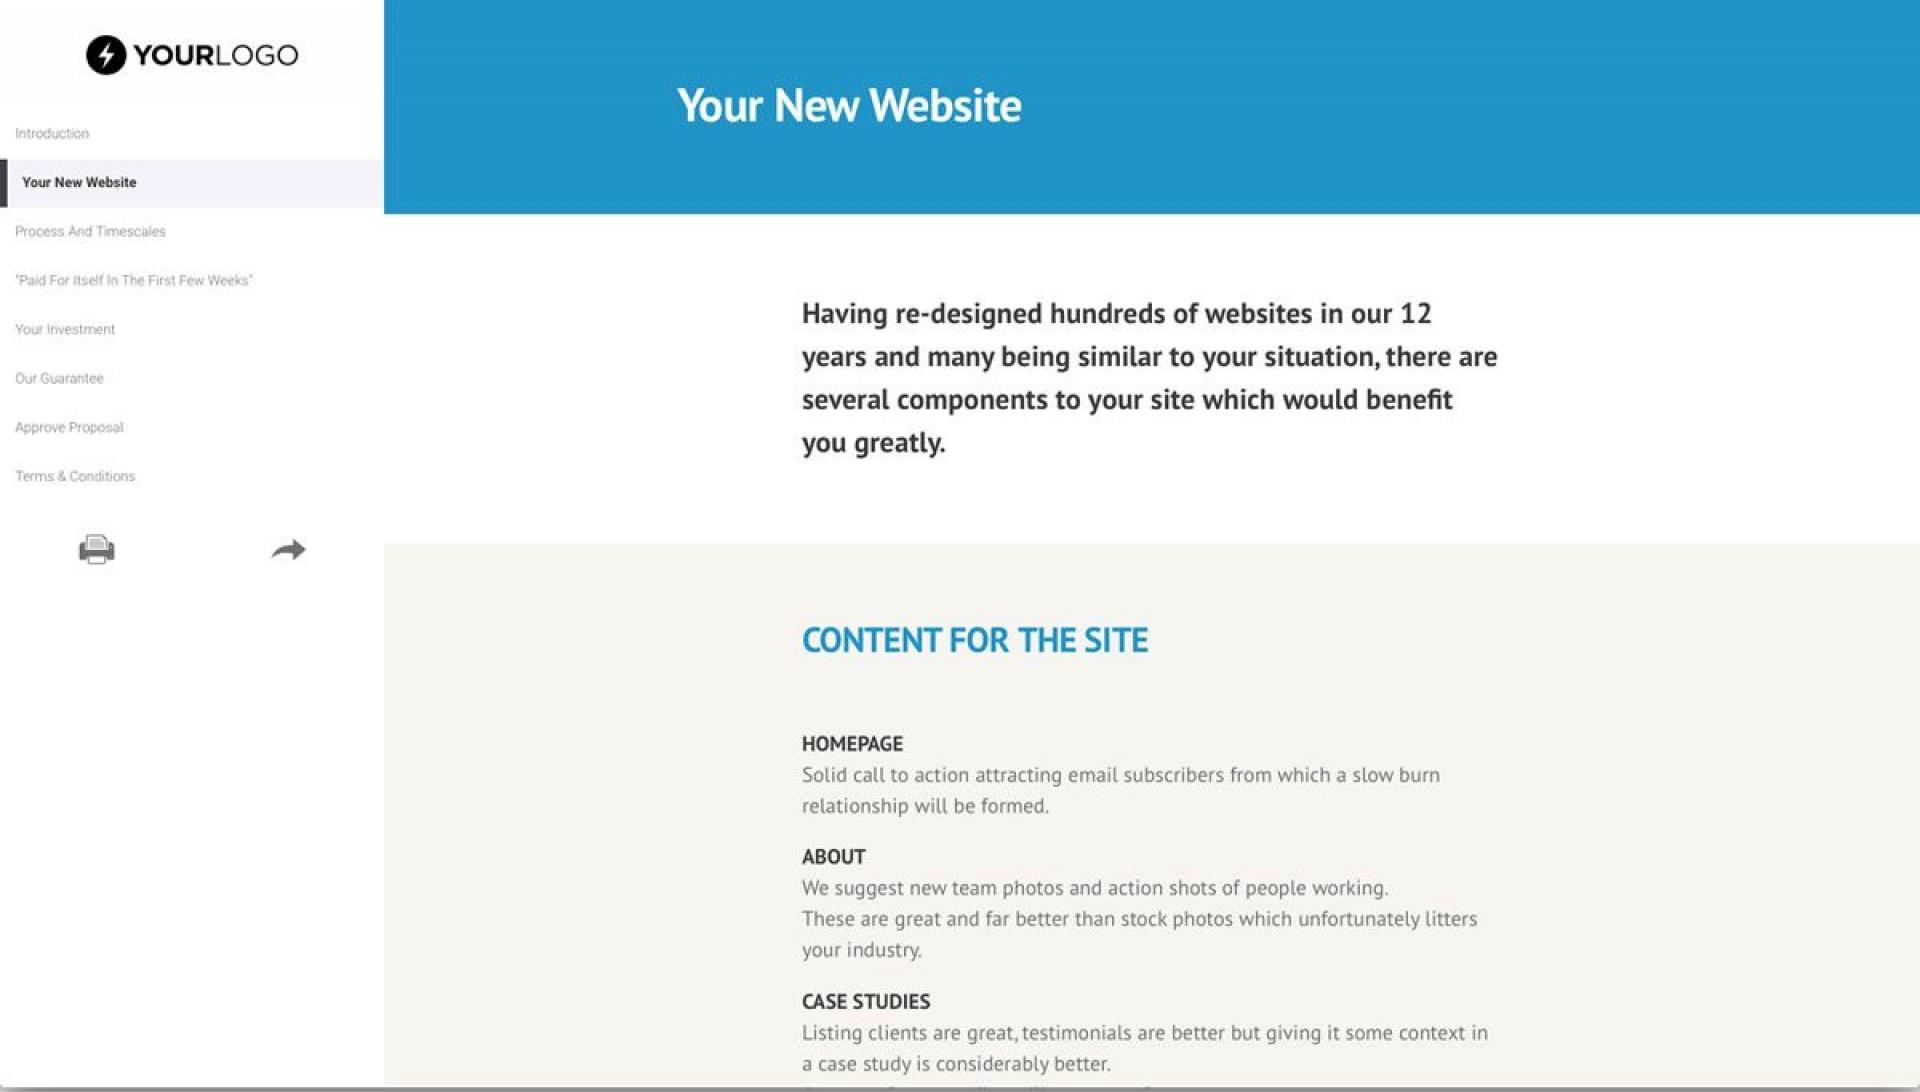 001 Wonderful Freelance Website Design Proposal Template 1920